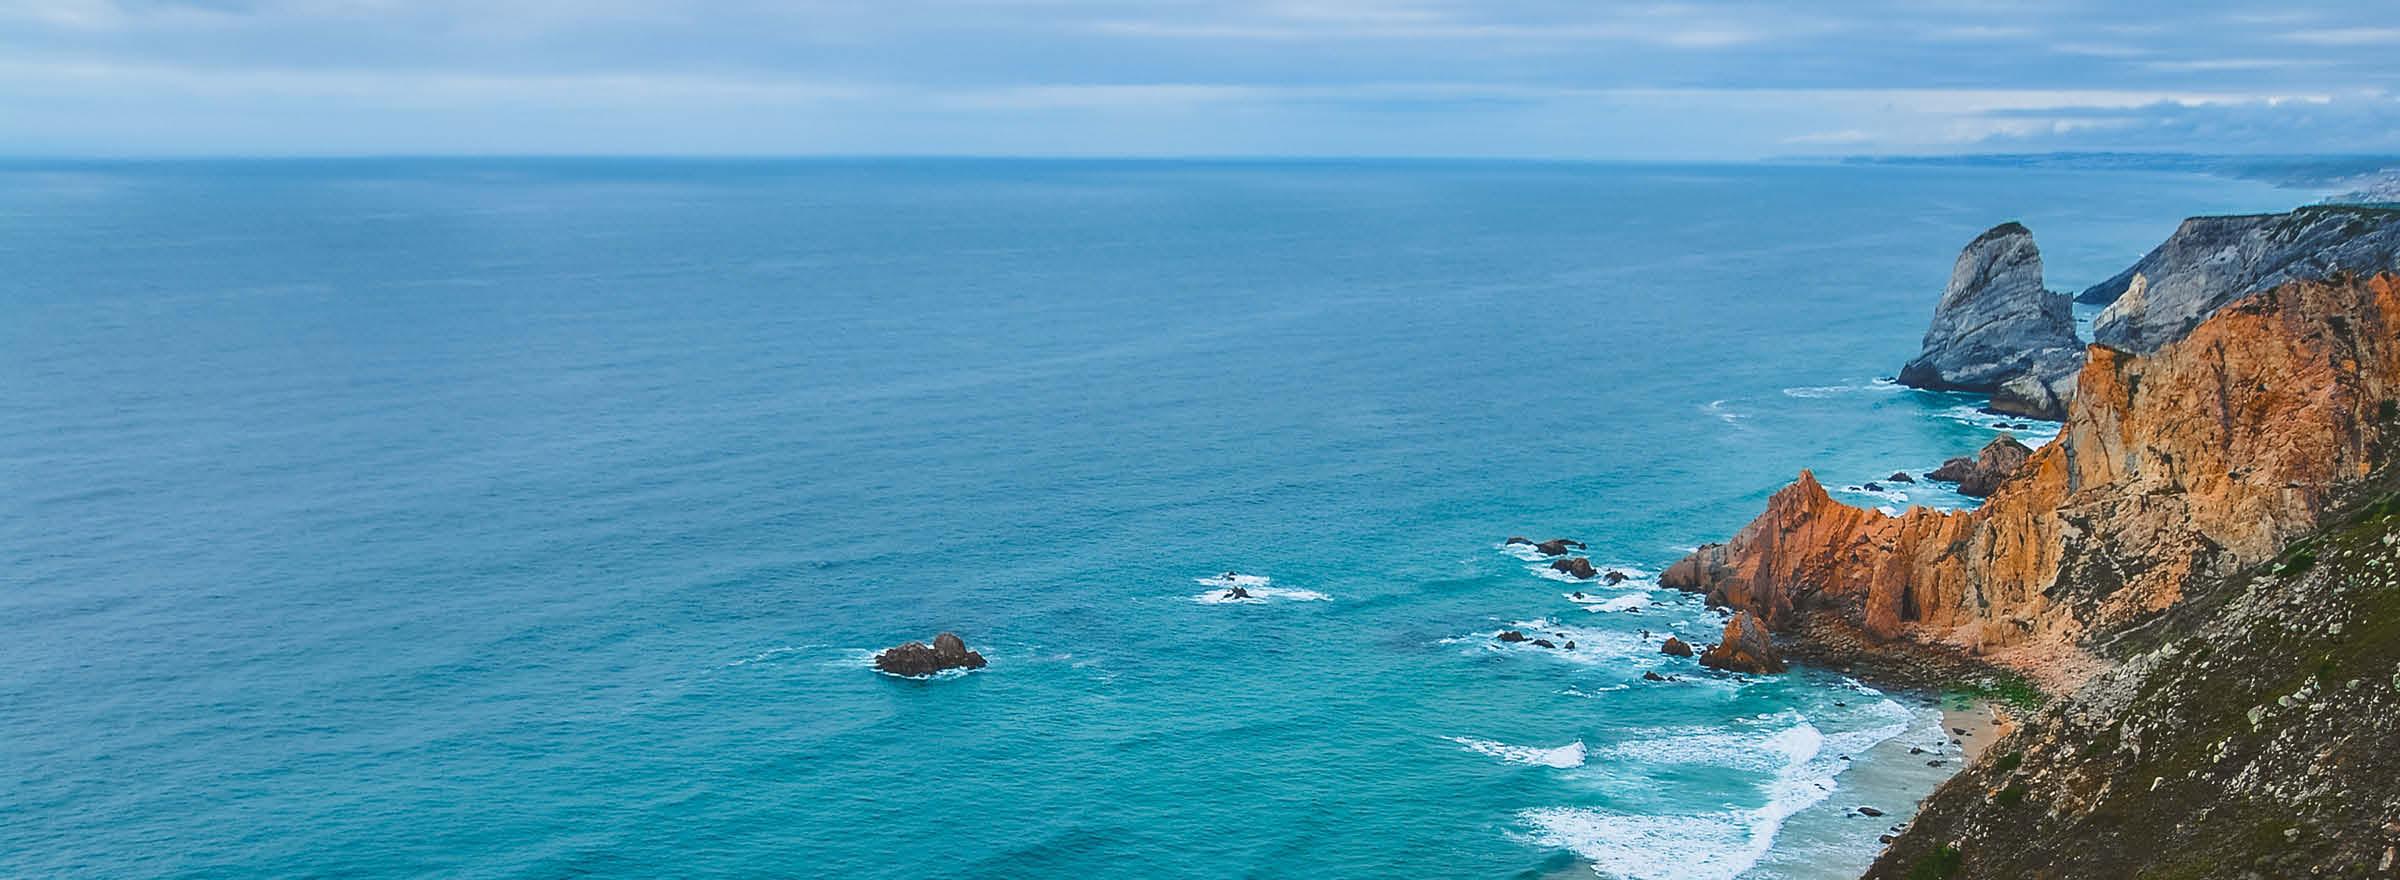 ocean washing up against a rocky coastline